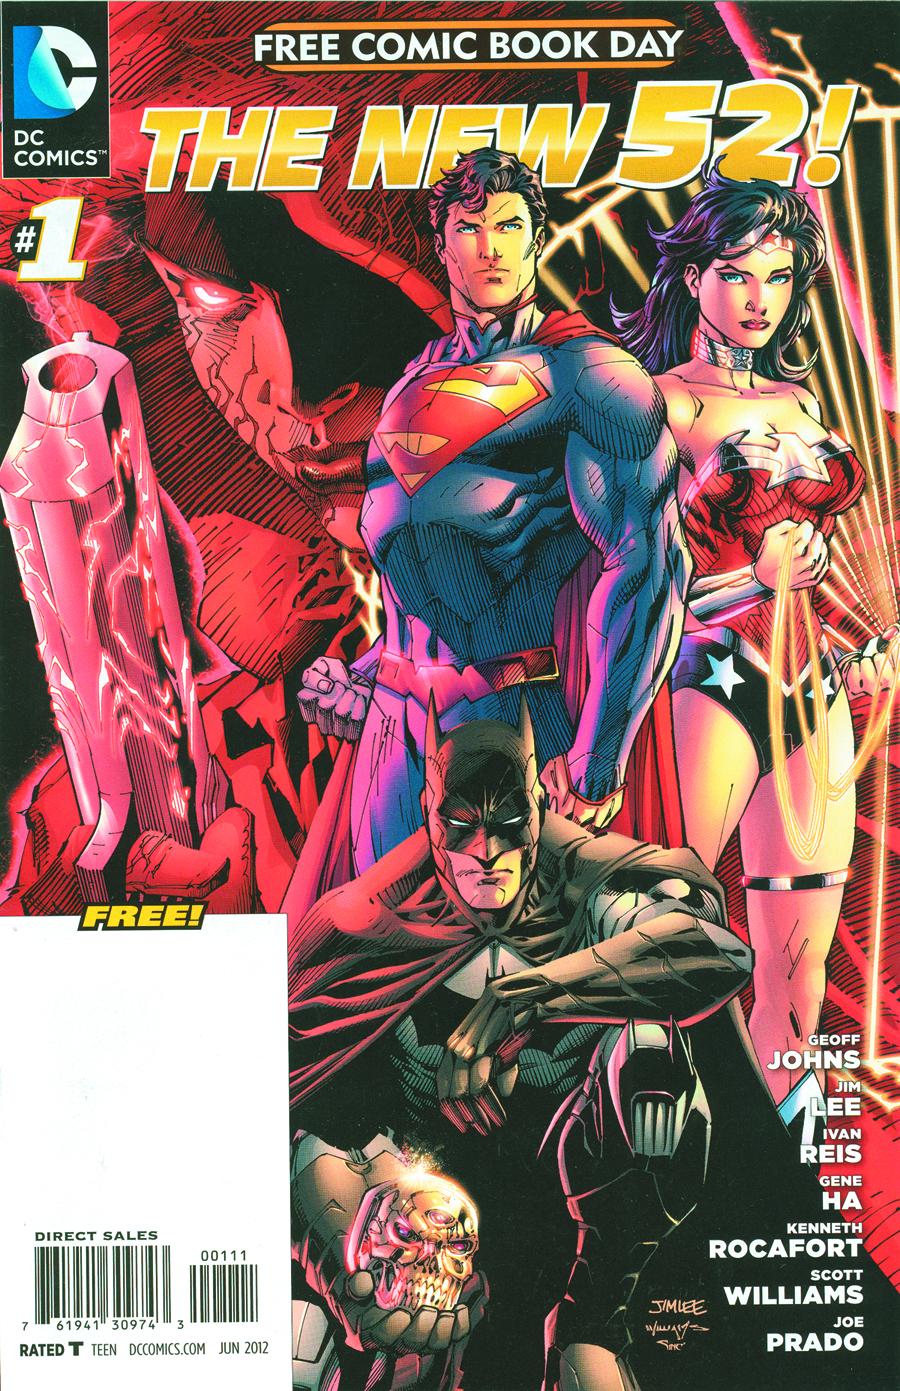 STK460685 Free Comic Book Day 2012: Reviews!